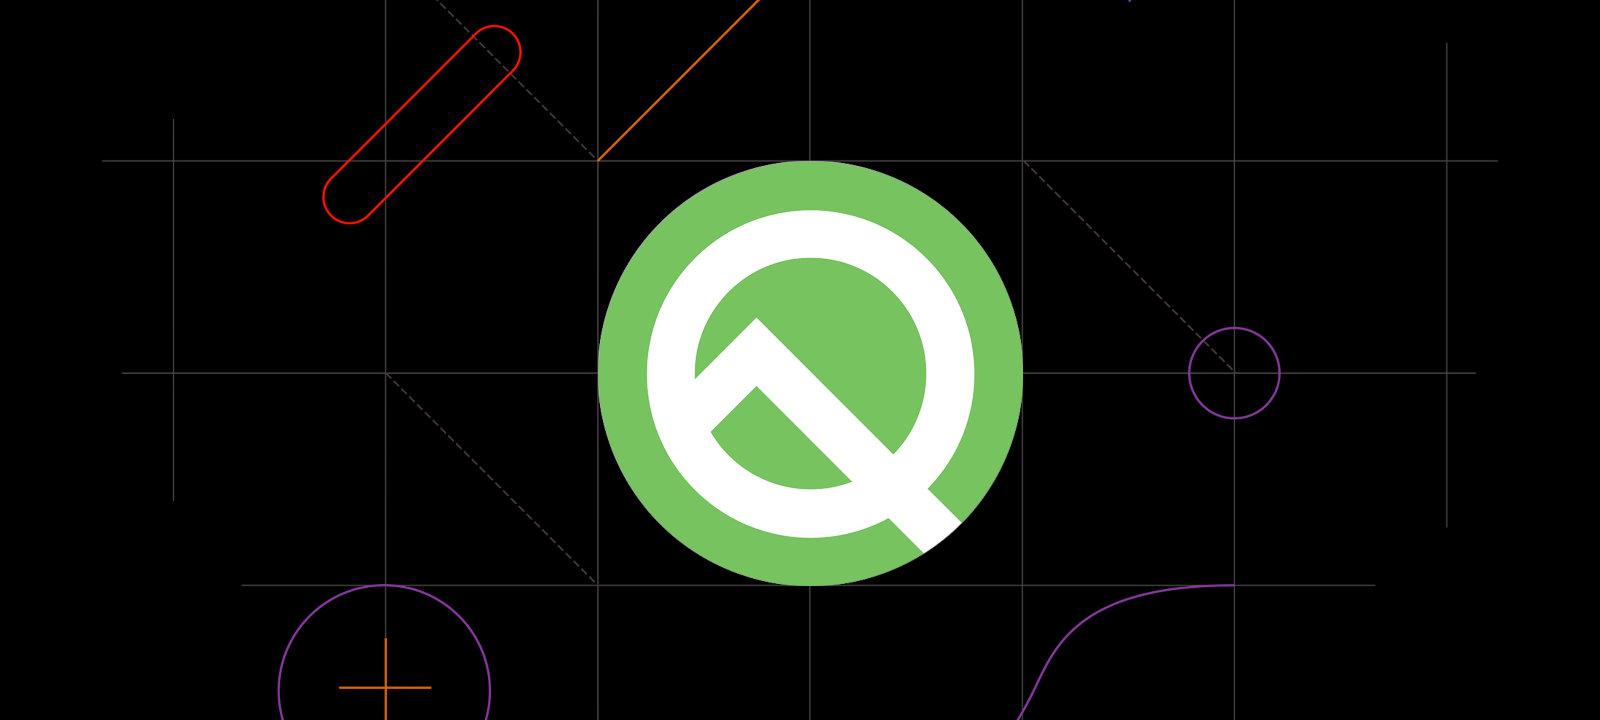 Android: security-новшества Android Q и эксплоит против смартфонов Samsung